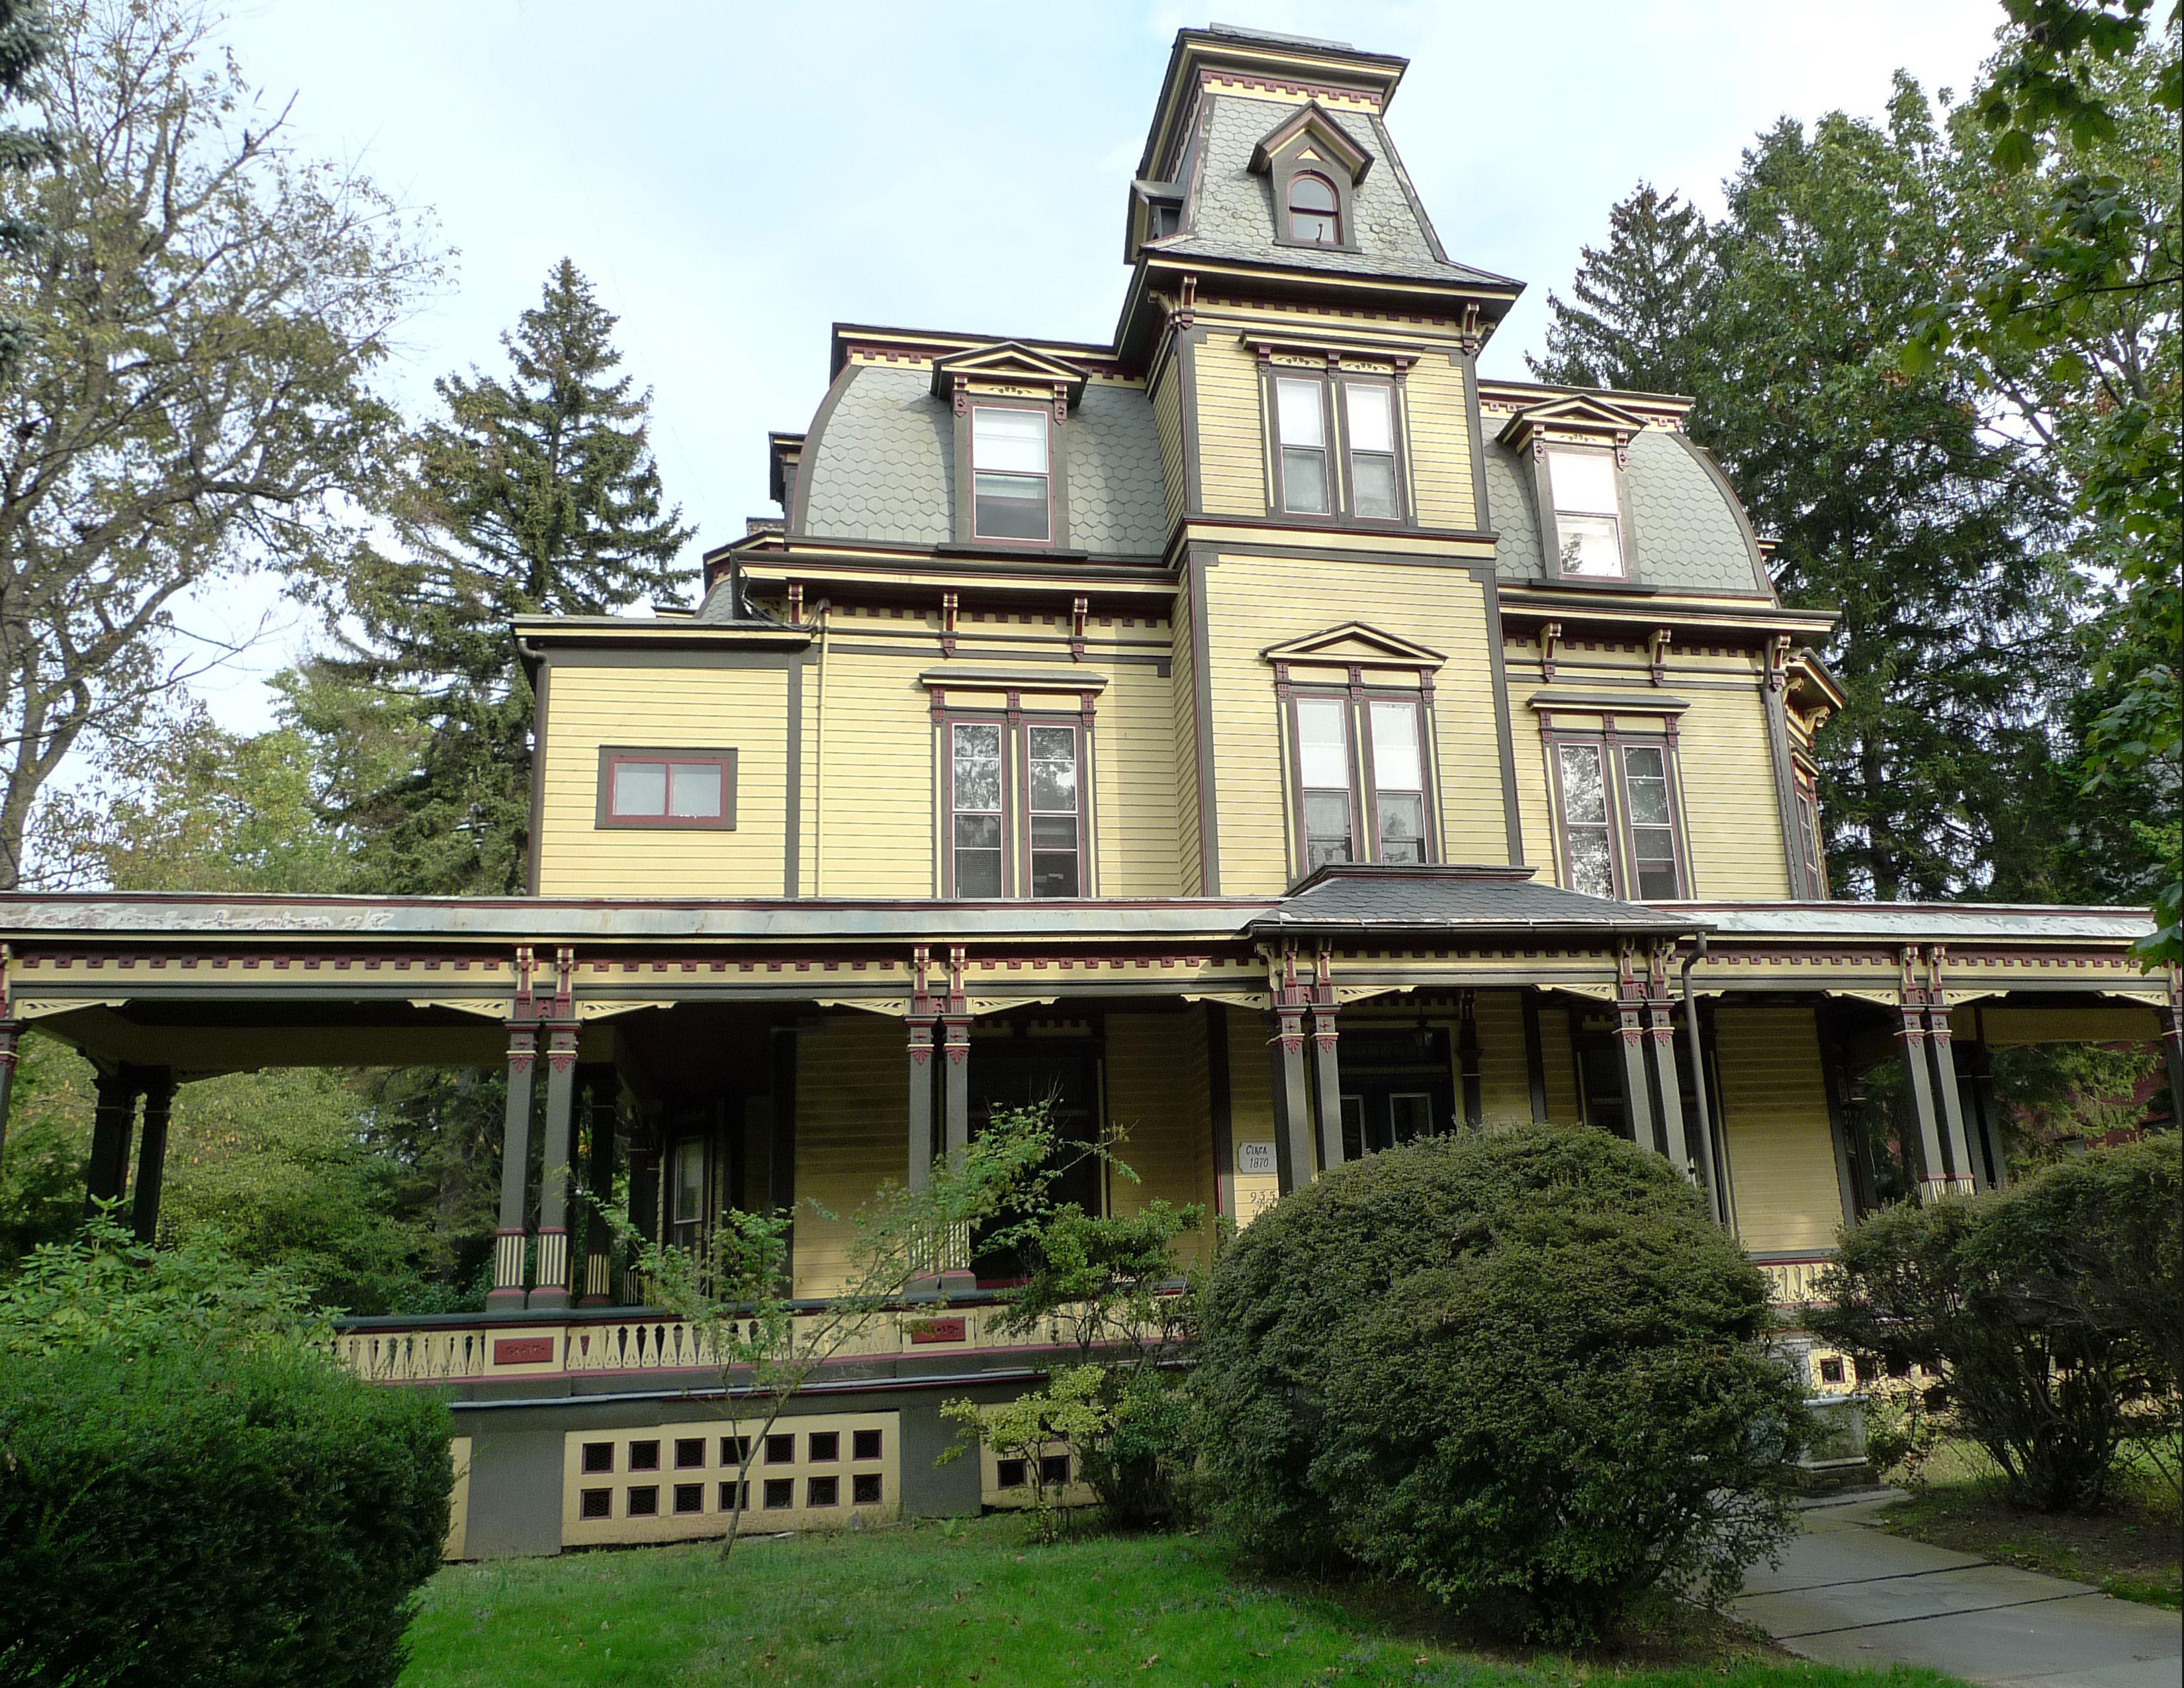 Van wyck brooks historic district plainfield nj second for Historic second empire house plans